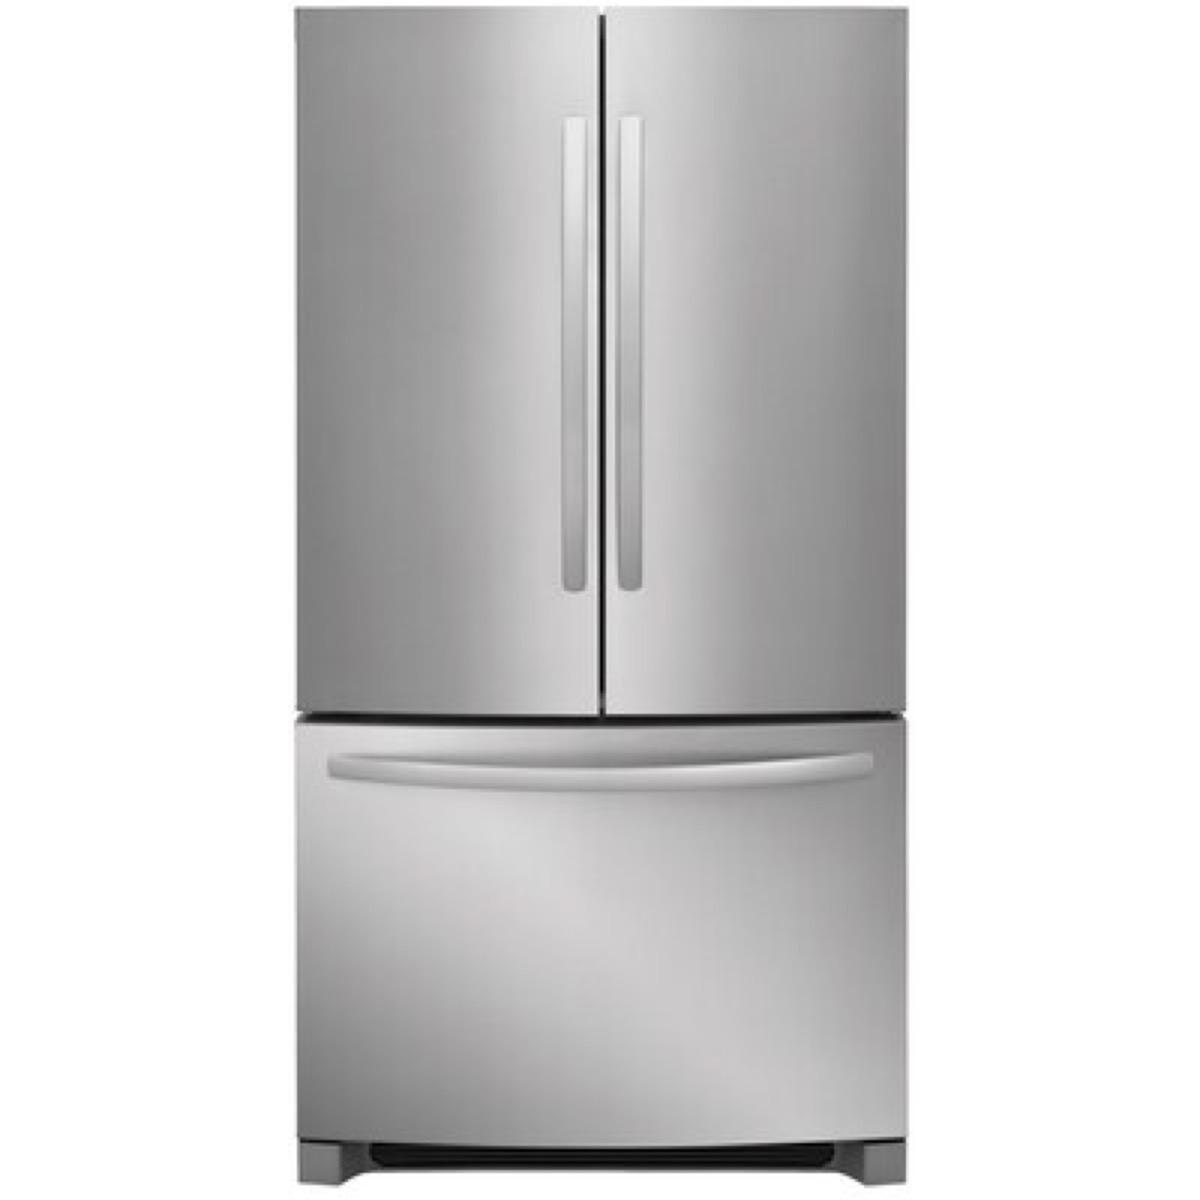 double door fridge white background